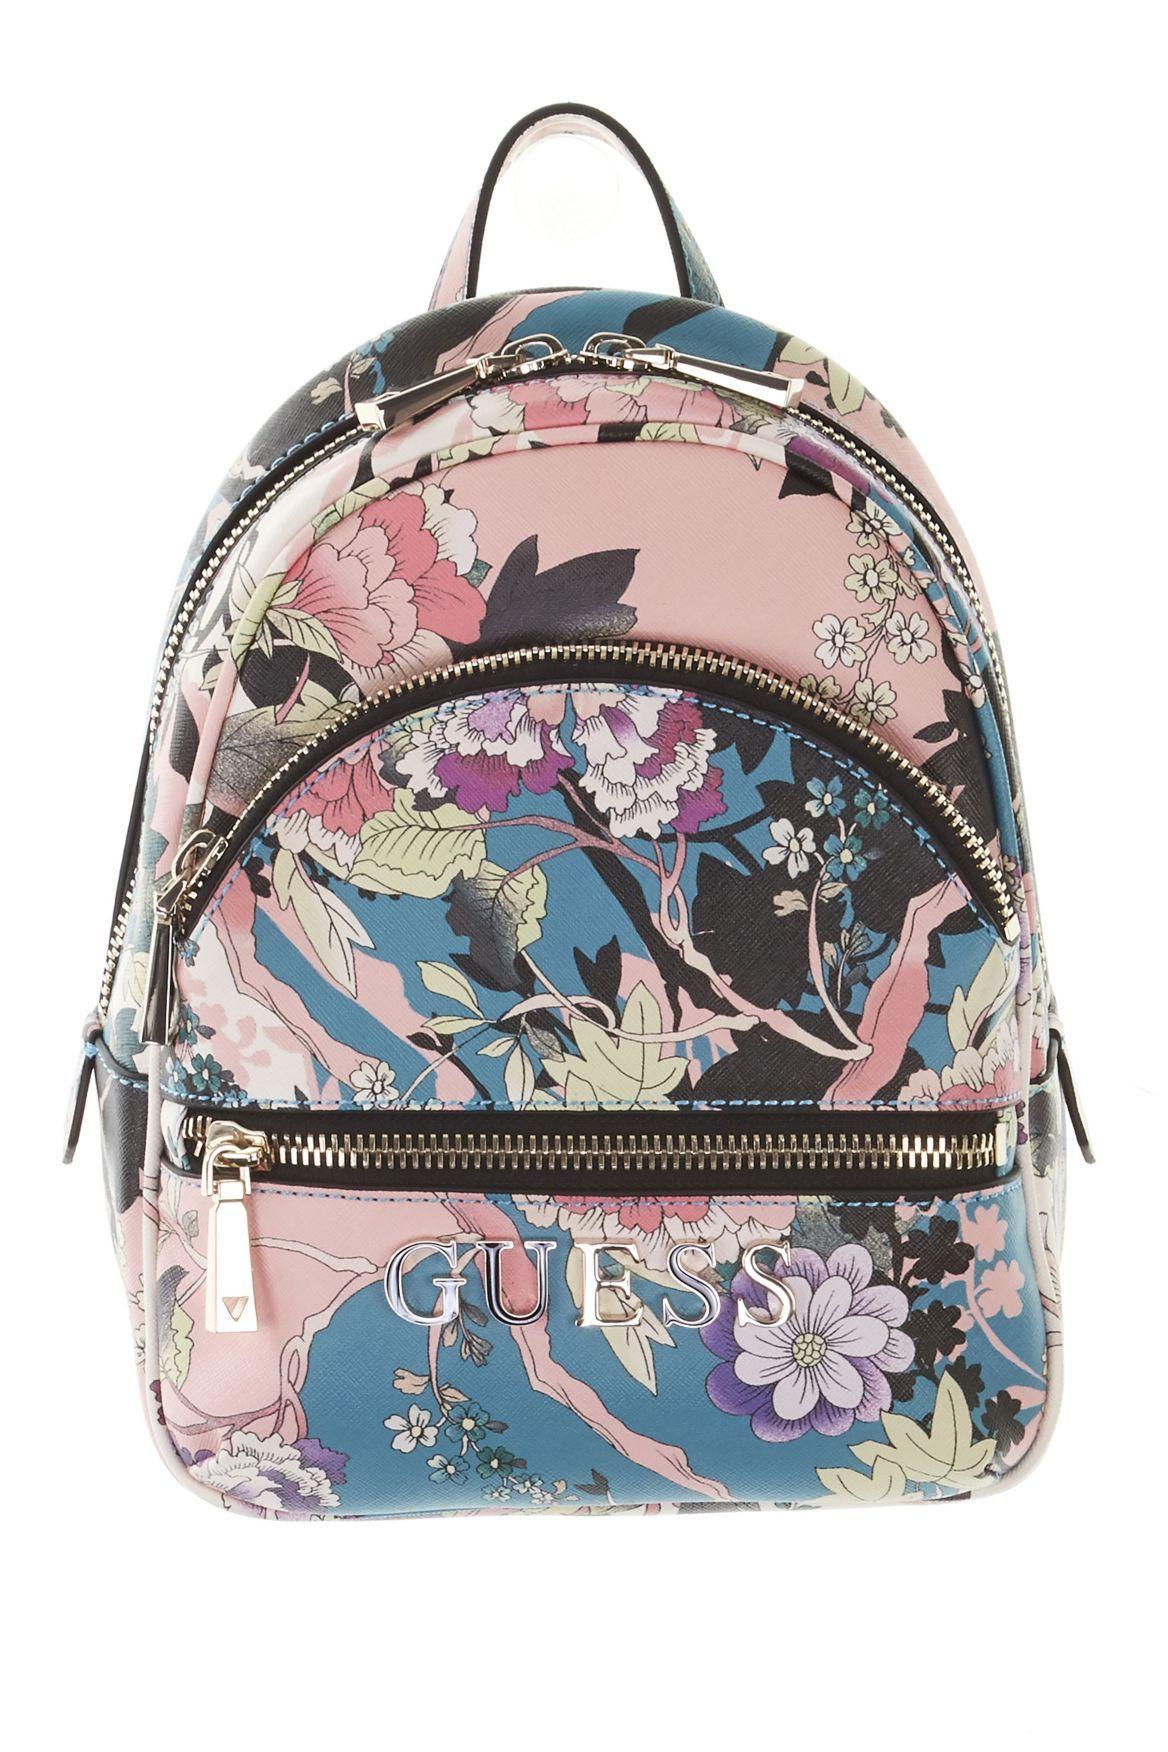 d93e96434f570e Guess Britta Small Backpack 3173396 Handbags Strandbags. Strandbags  Tignanello ...